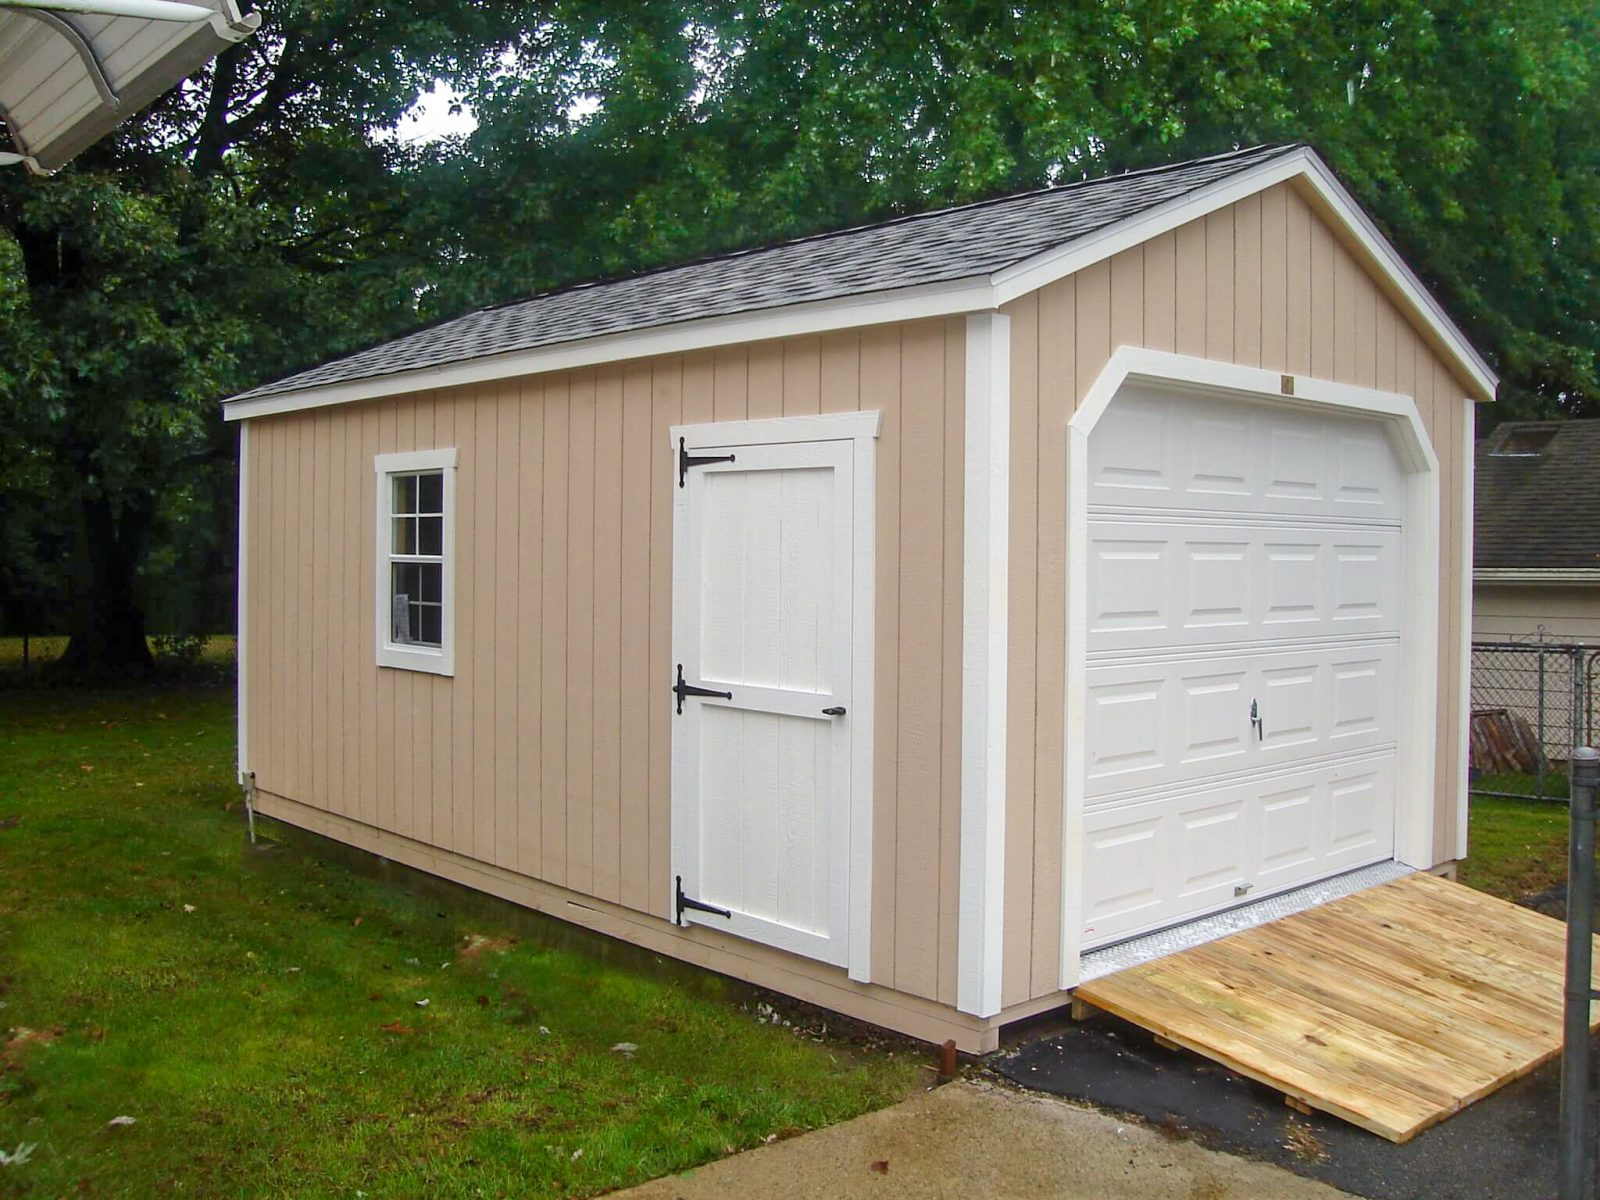 portable detached garages in worcester massachusetts